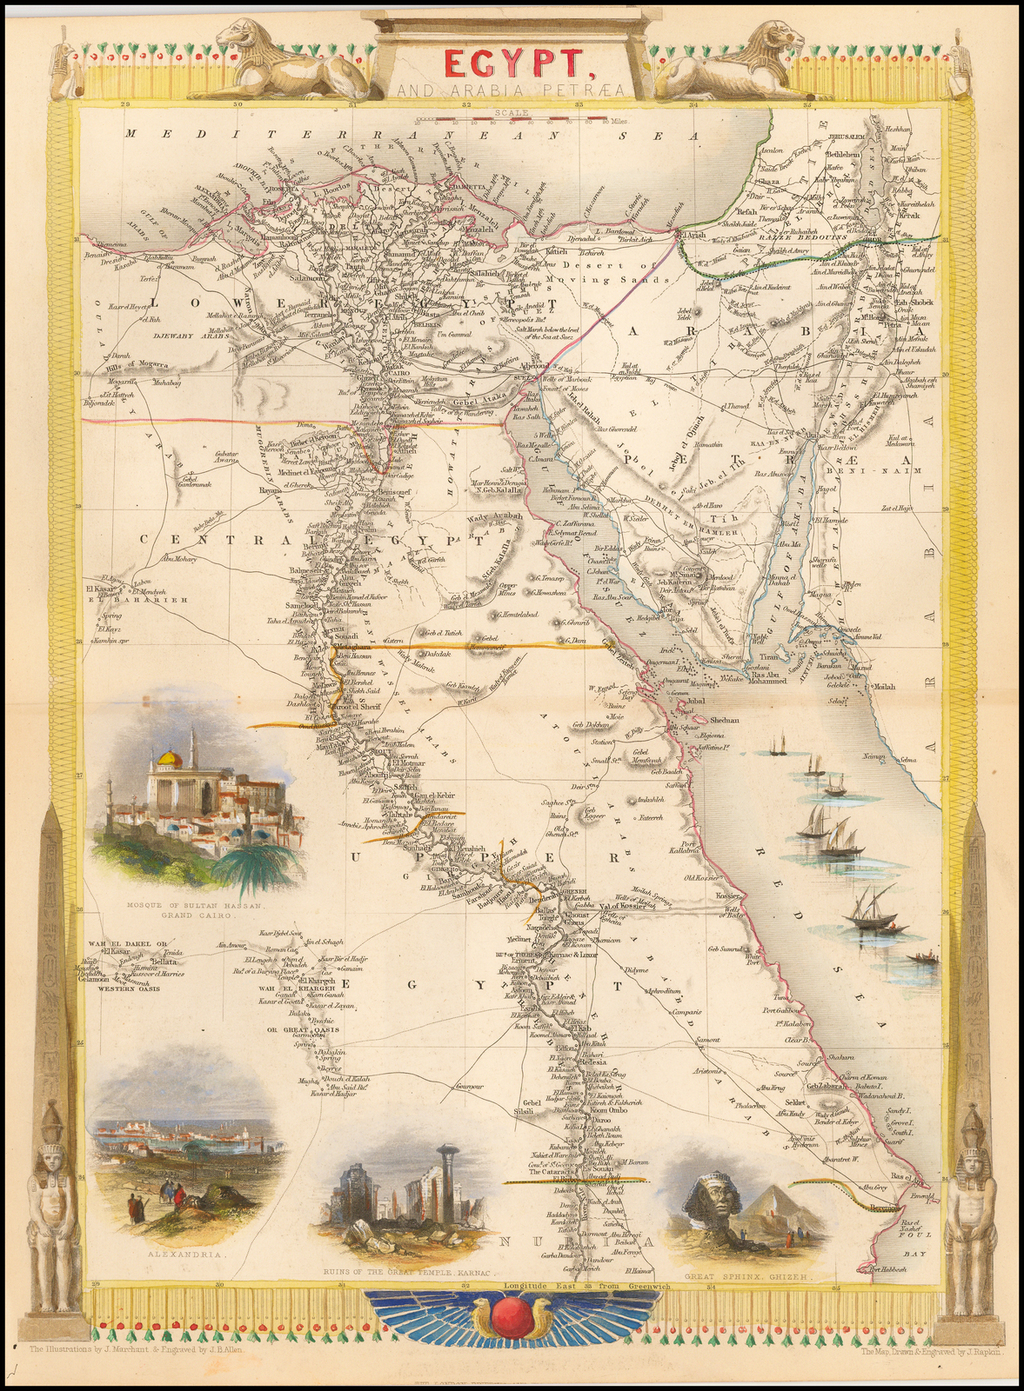 Egypt, And Arabia Petraea By John Tallis